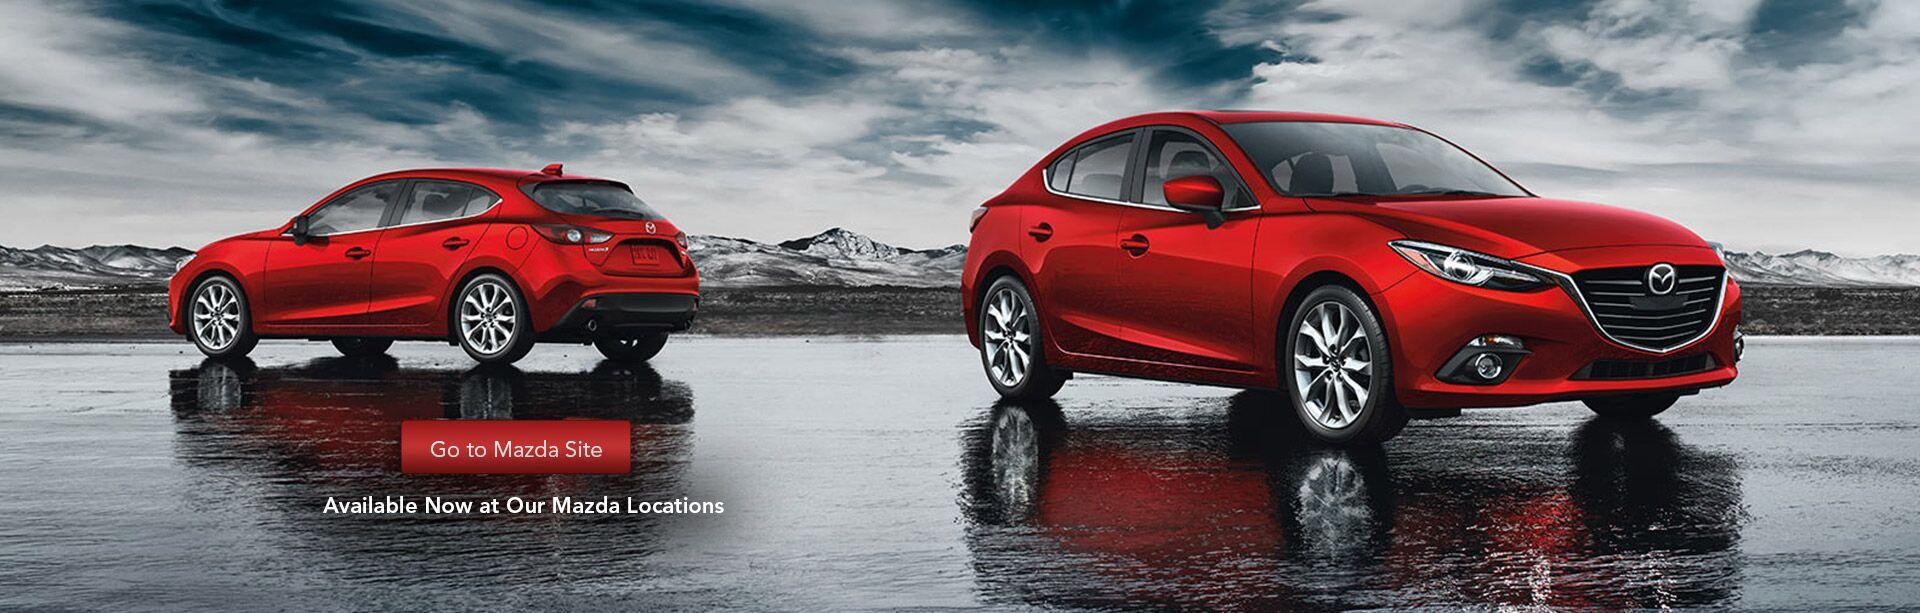 Cardinale Automotive Group Seaside CA | GMC Hyundai Mazda Nissan Toyota Volkswagen Dealers | GMC ...